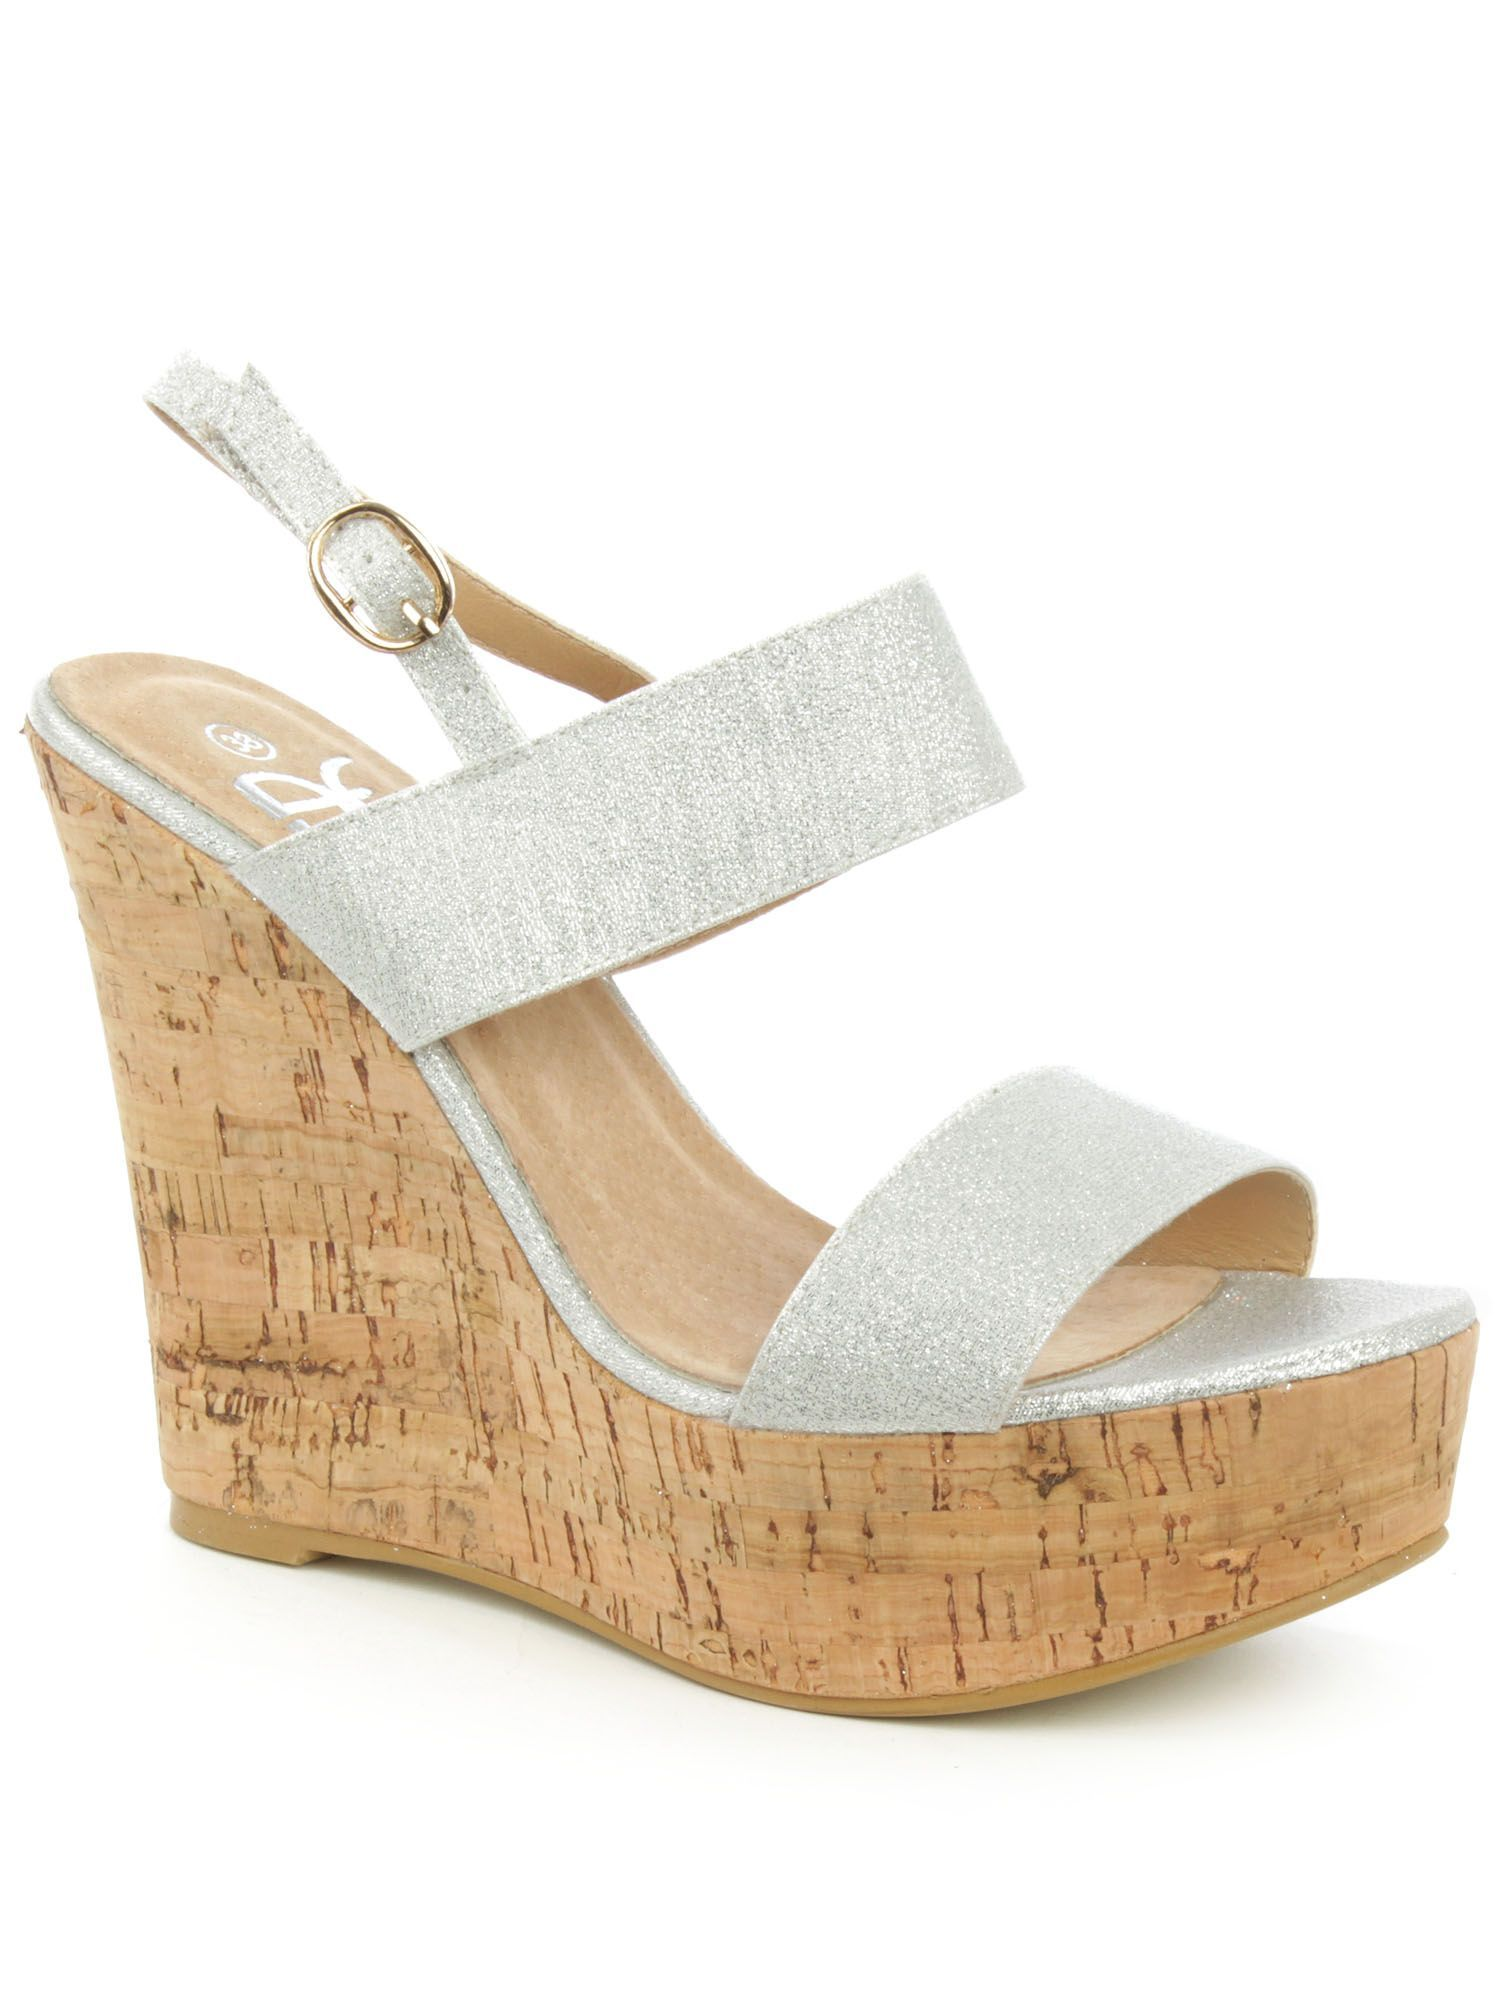 Daniel Wirral shimmer high cork wedge sandals, Silver Metallic